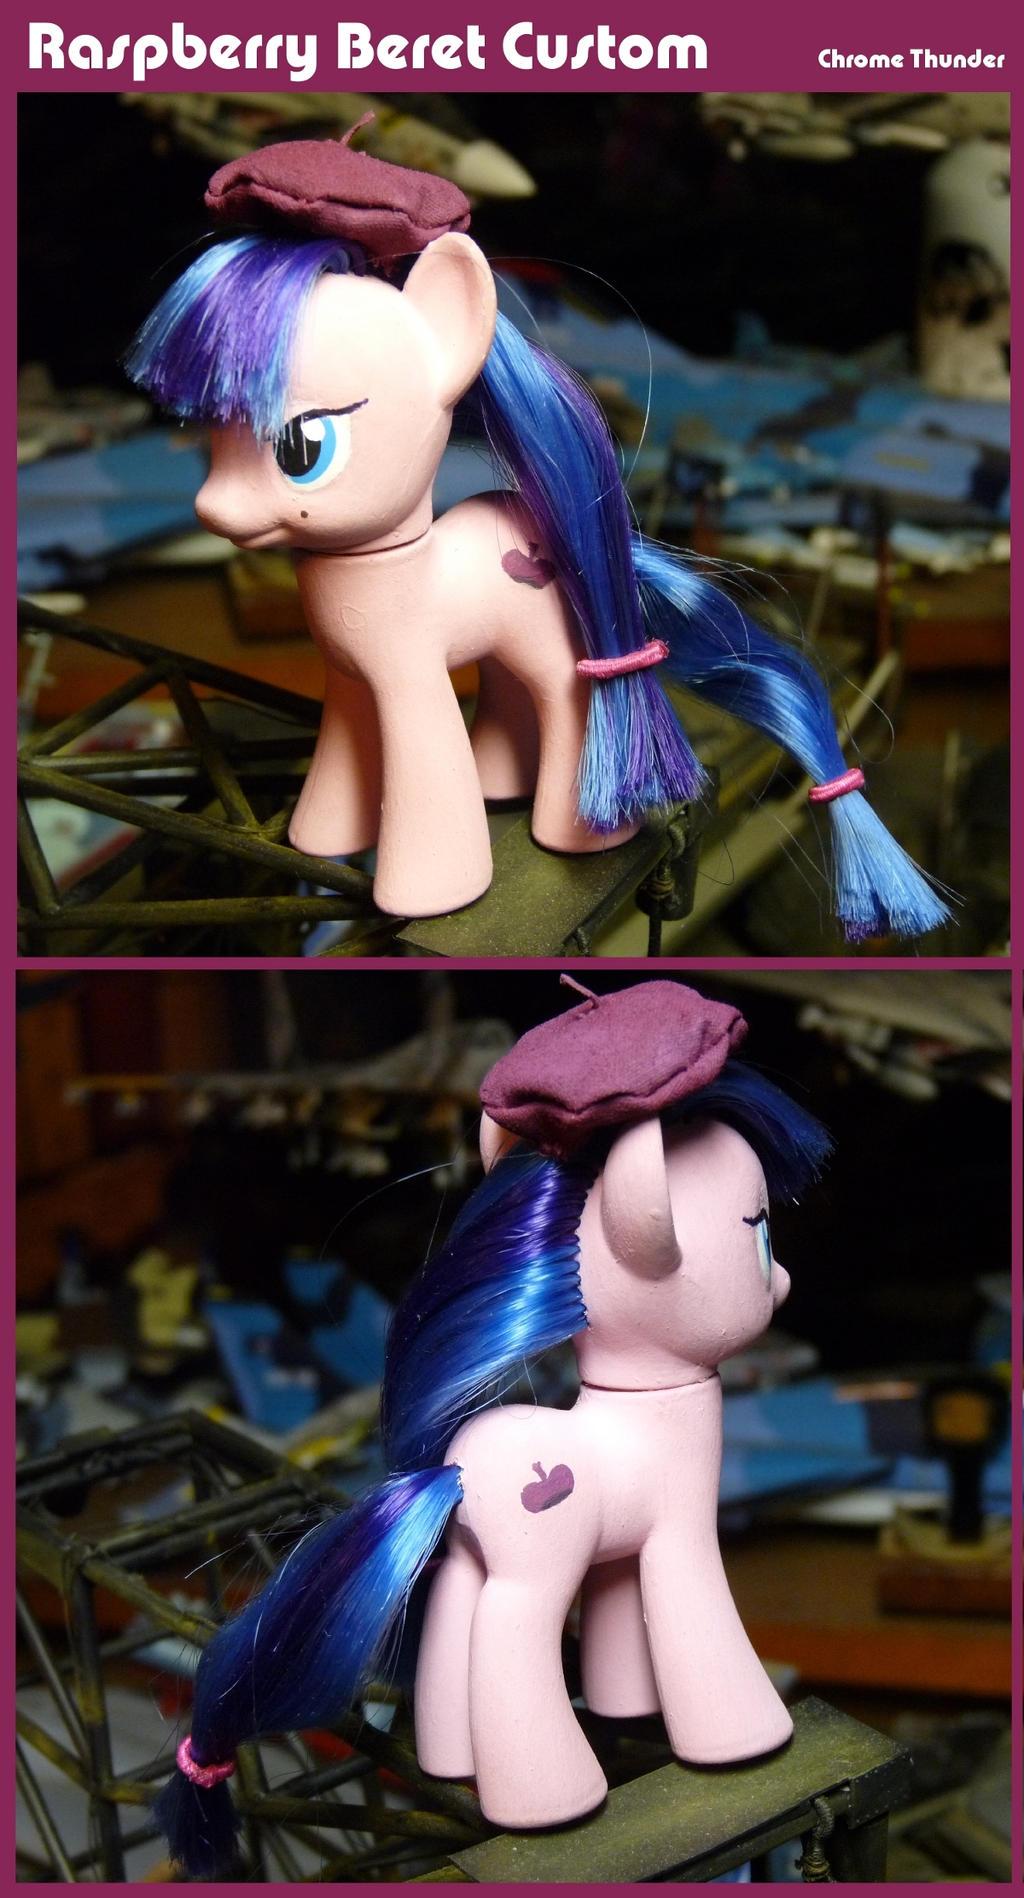 Raspberry Beret Pony Custom